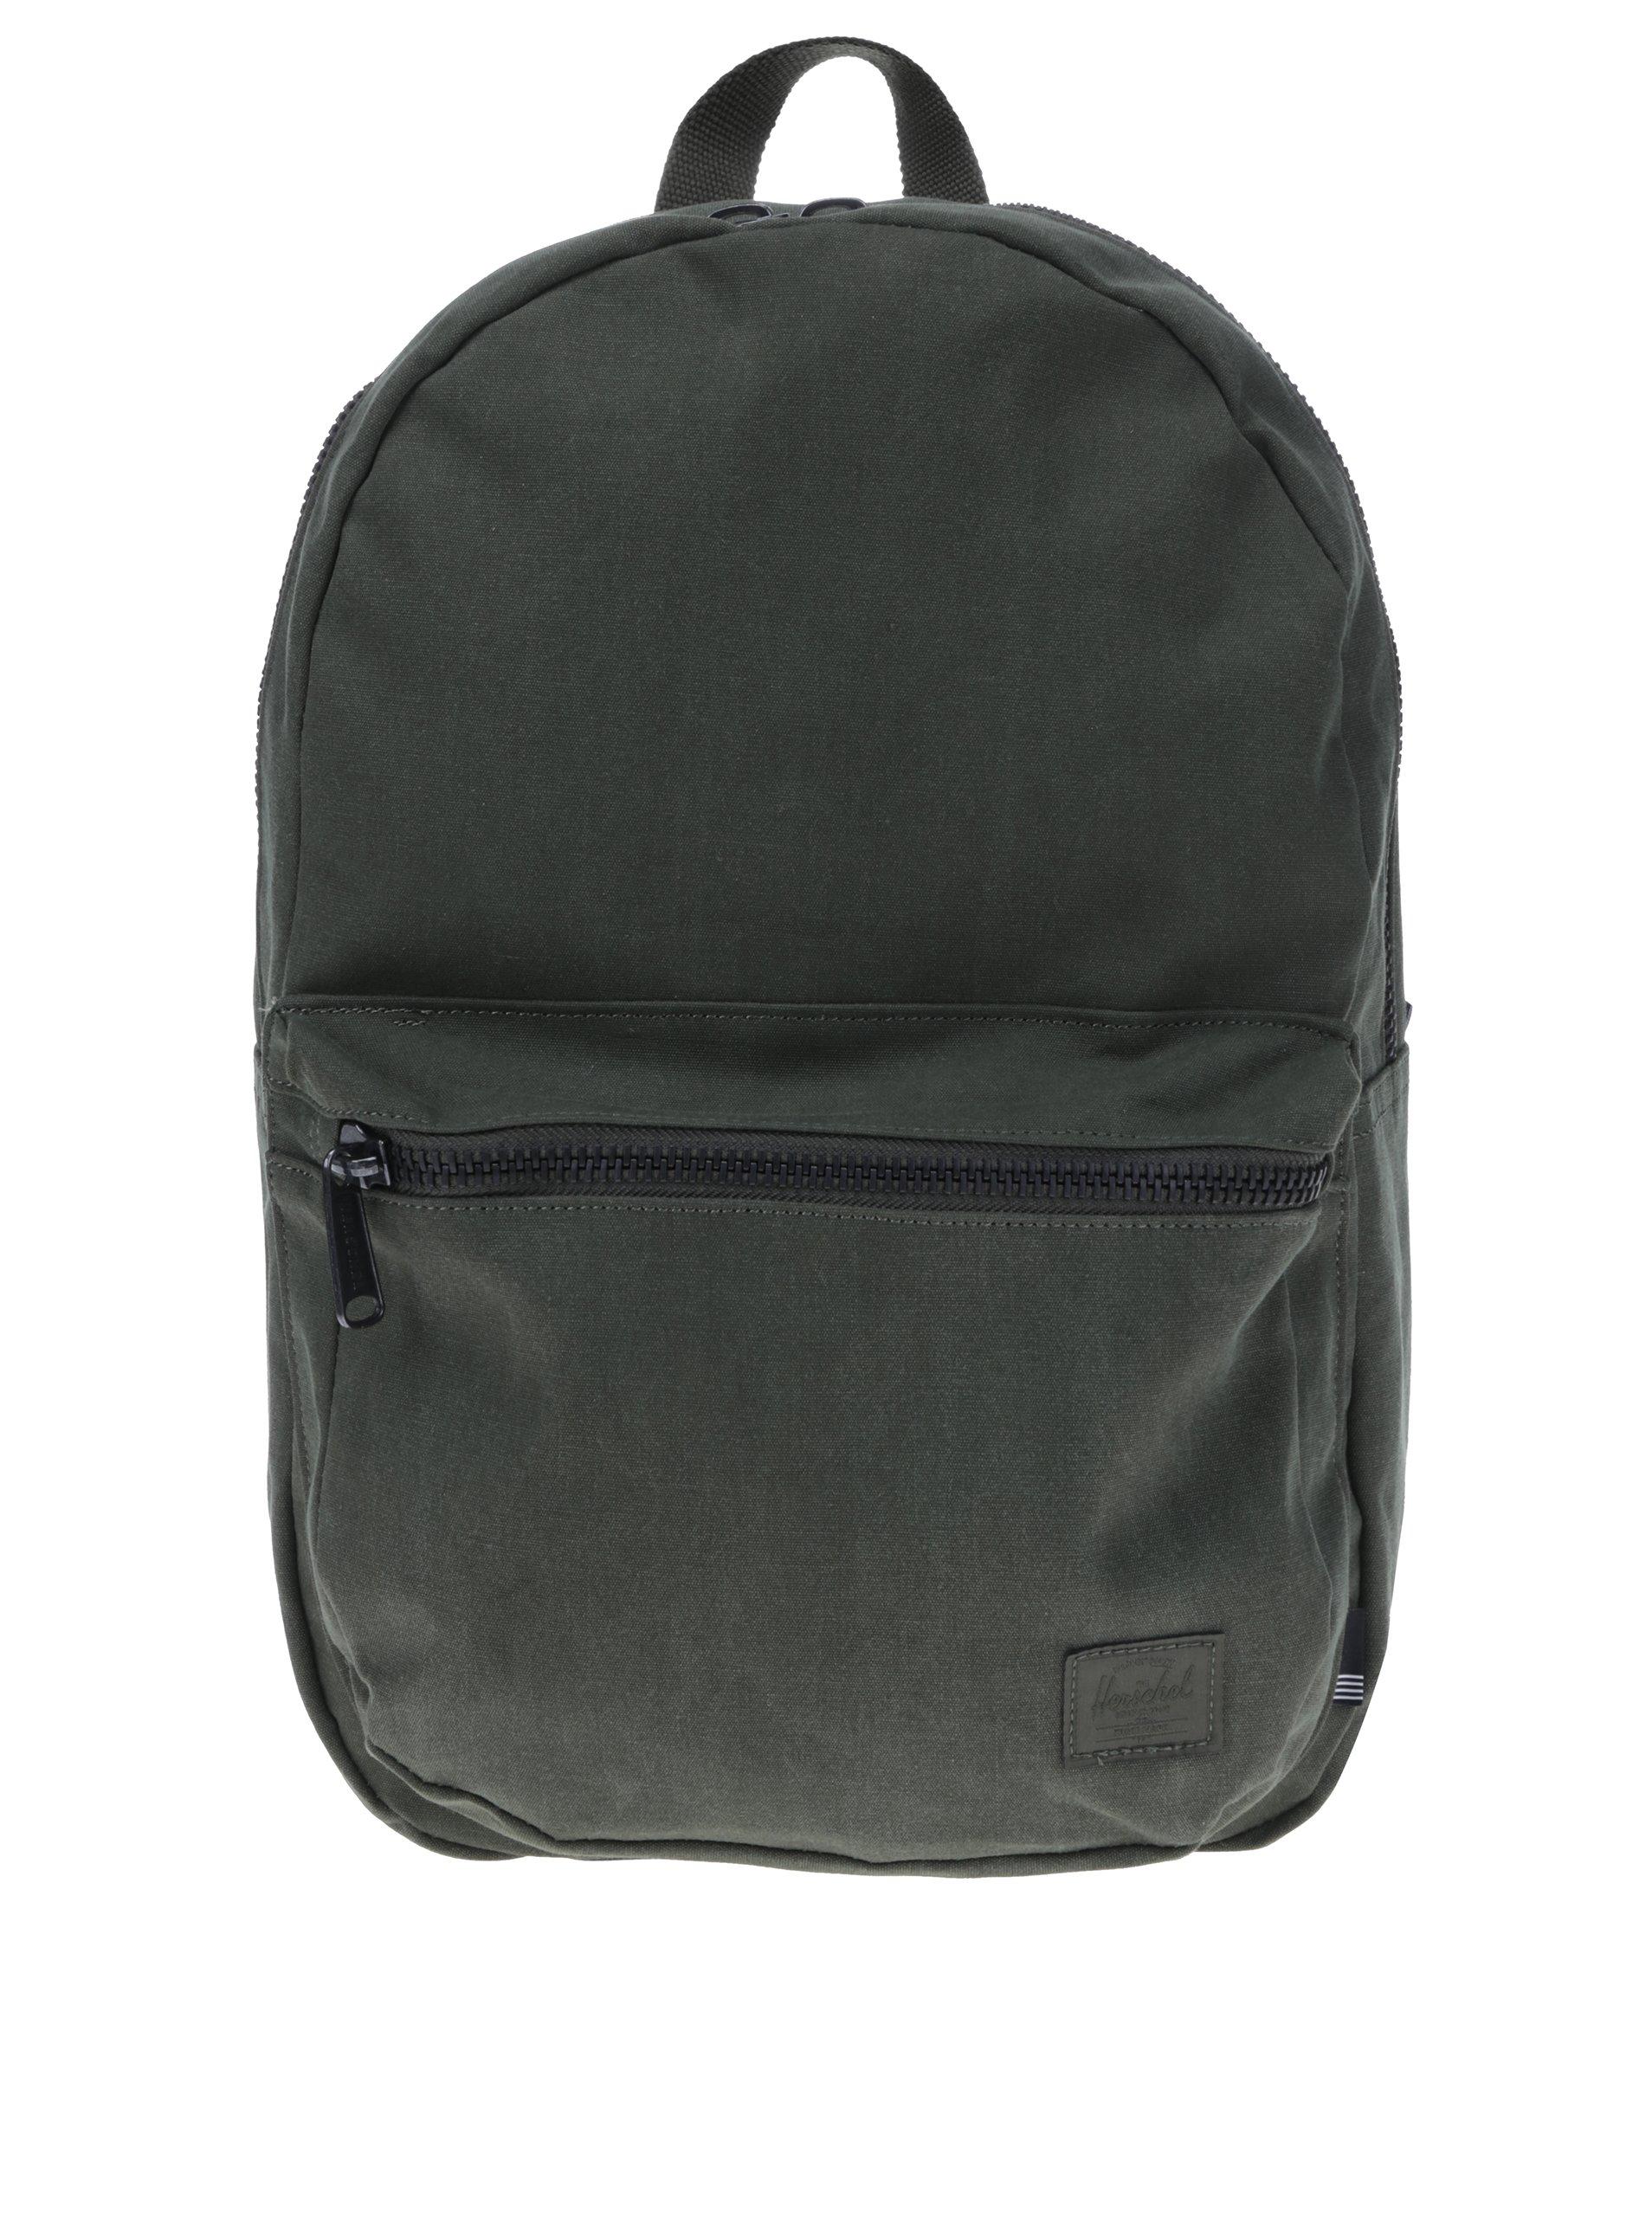 Tmavě zelený unisex batoh Herschel Lawson 22 l